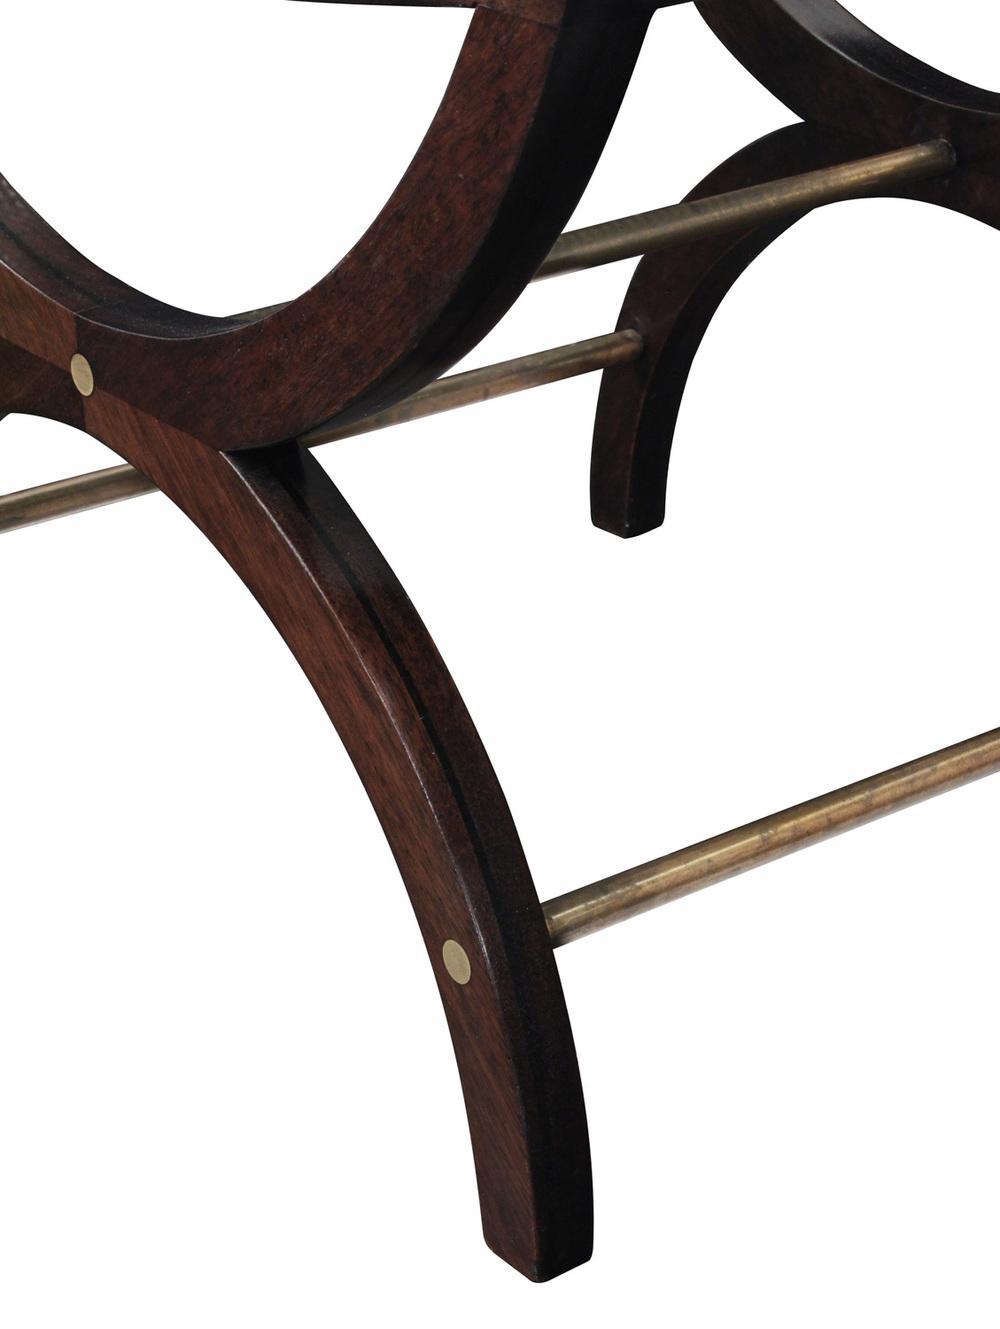 Dunbar 55 mahg+inset cane top bench105 detail3 hires.jpg